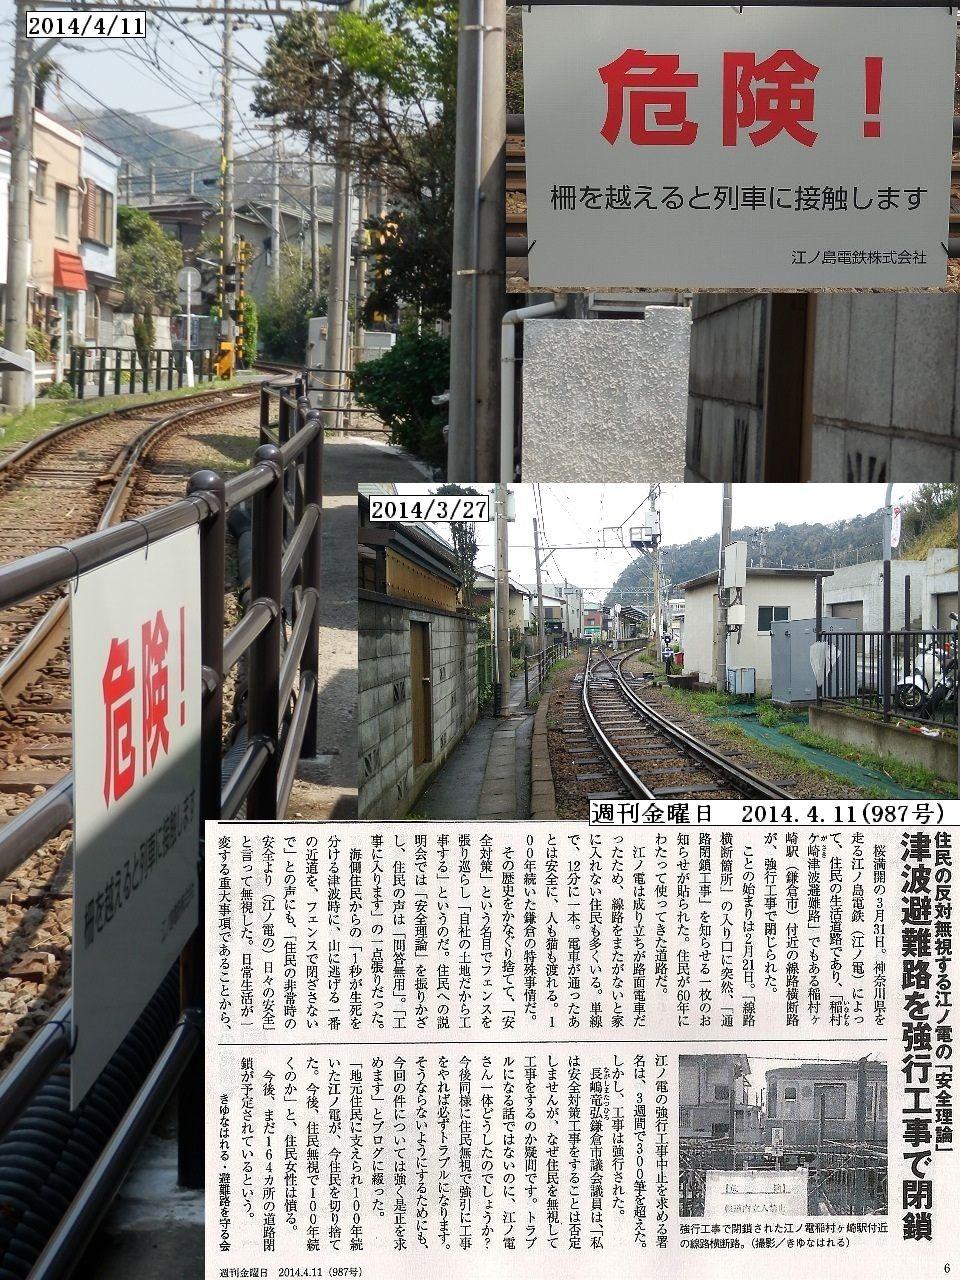 http://fujikama.coolblog.jp/2014/APR/20140410E.jpg